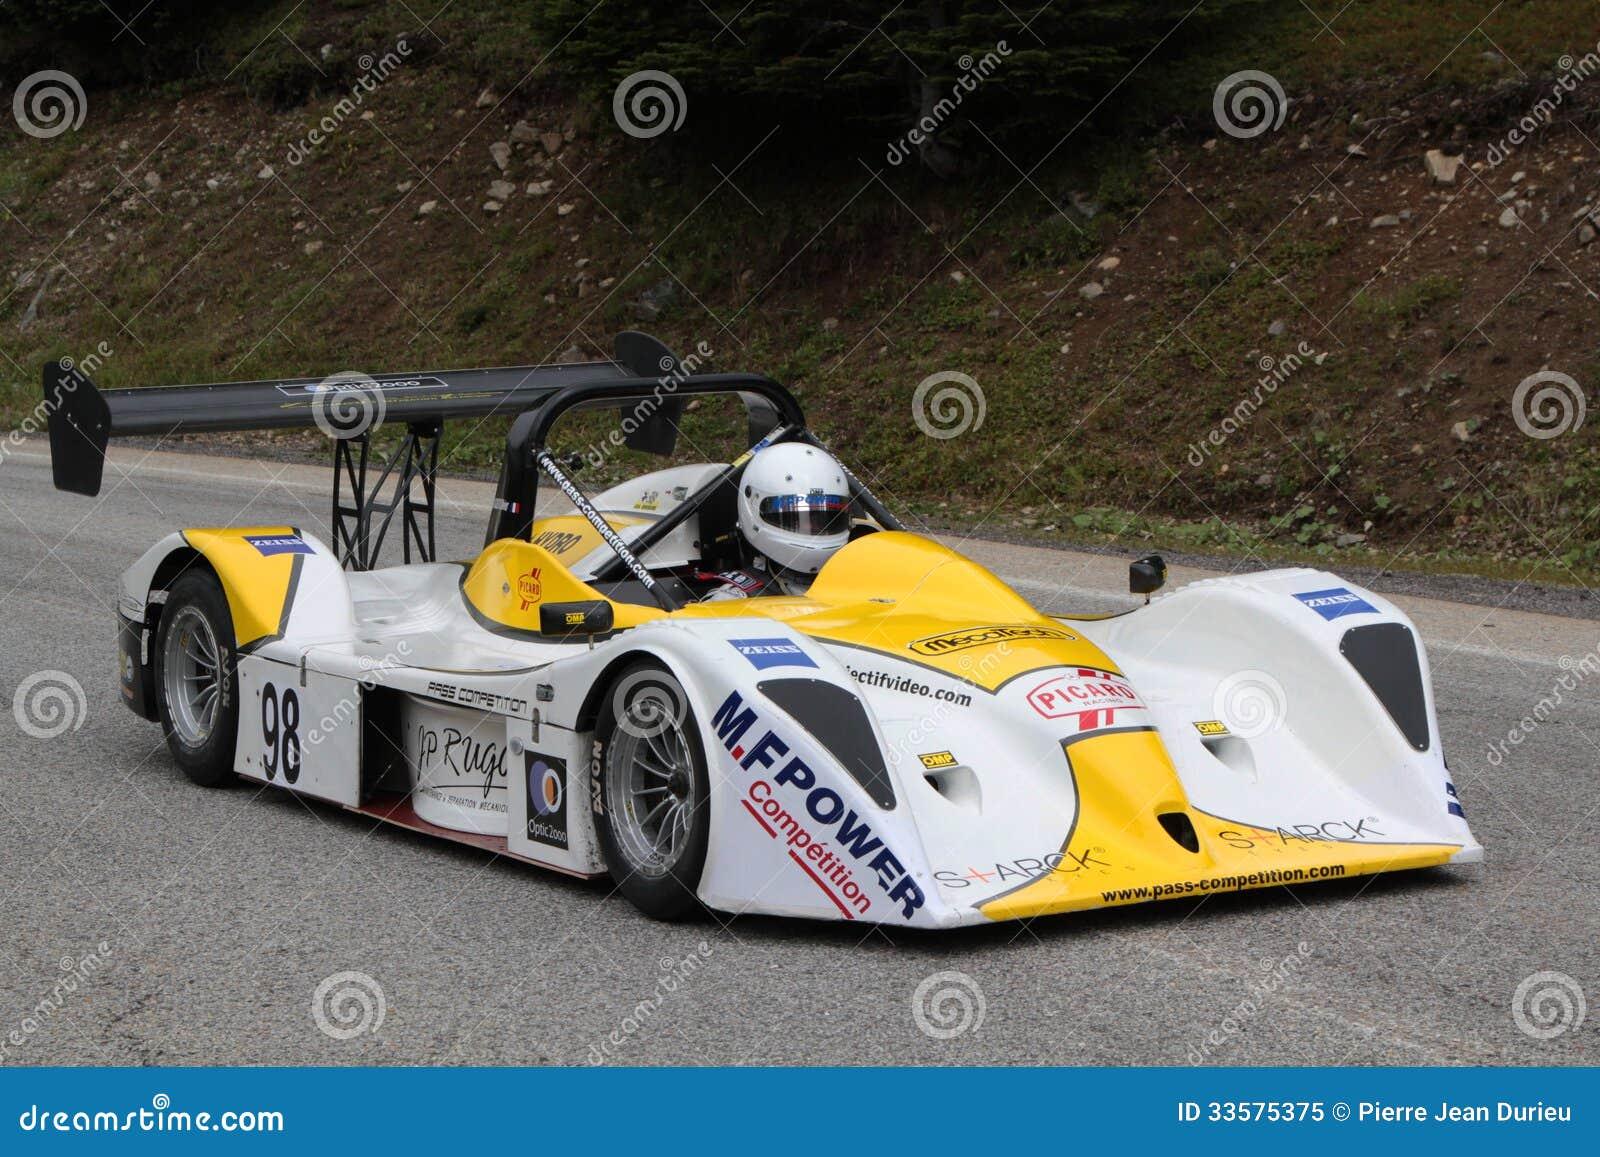 racing car editorial image image 33575375. Black Bedroom Furniture Sets. Home Design Ideas